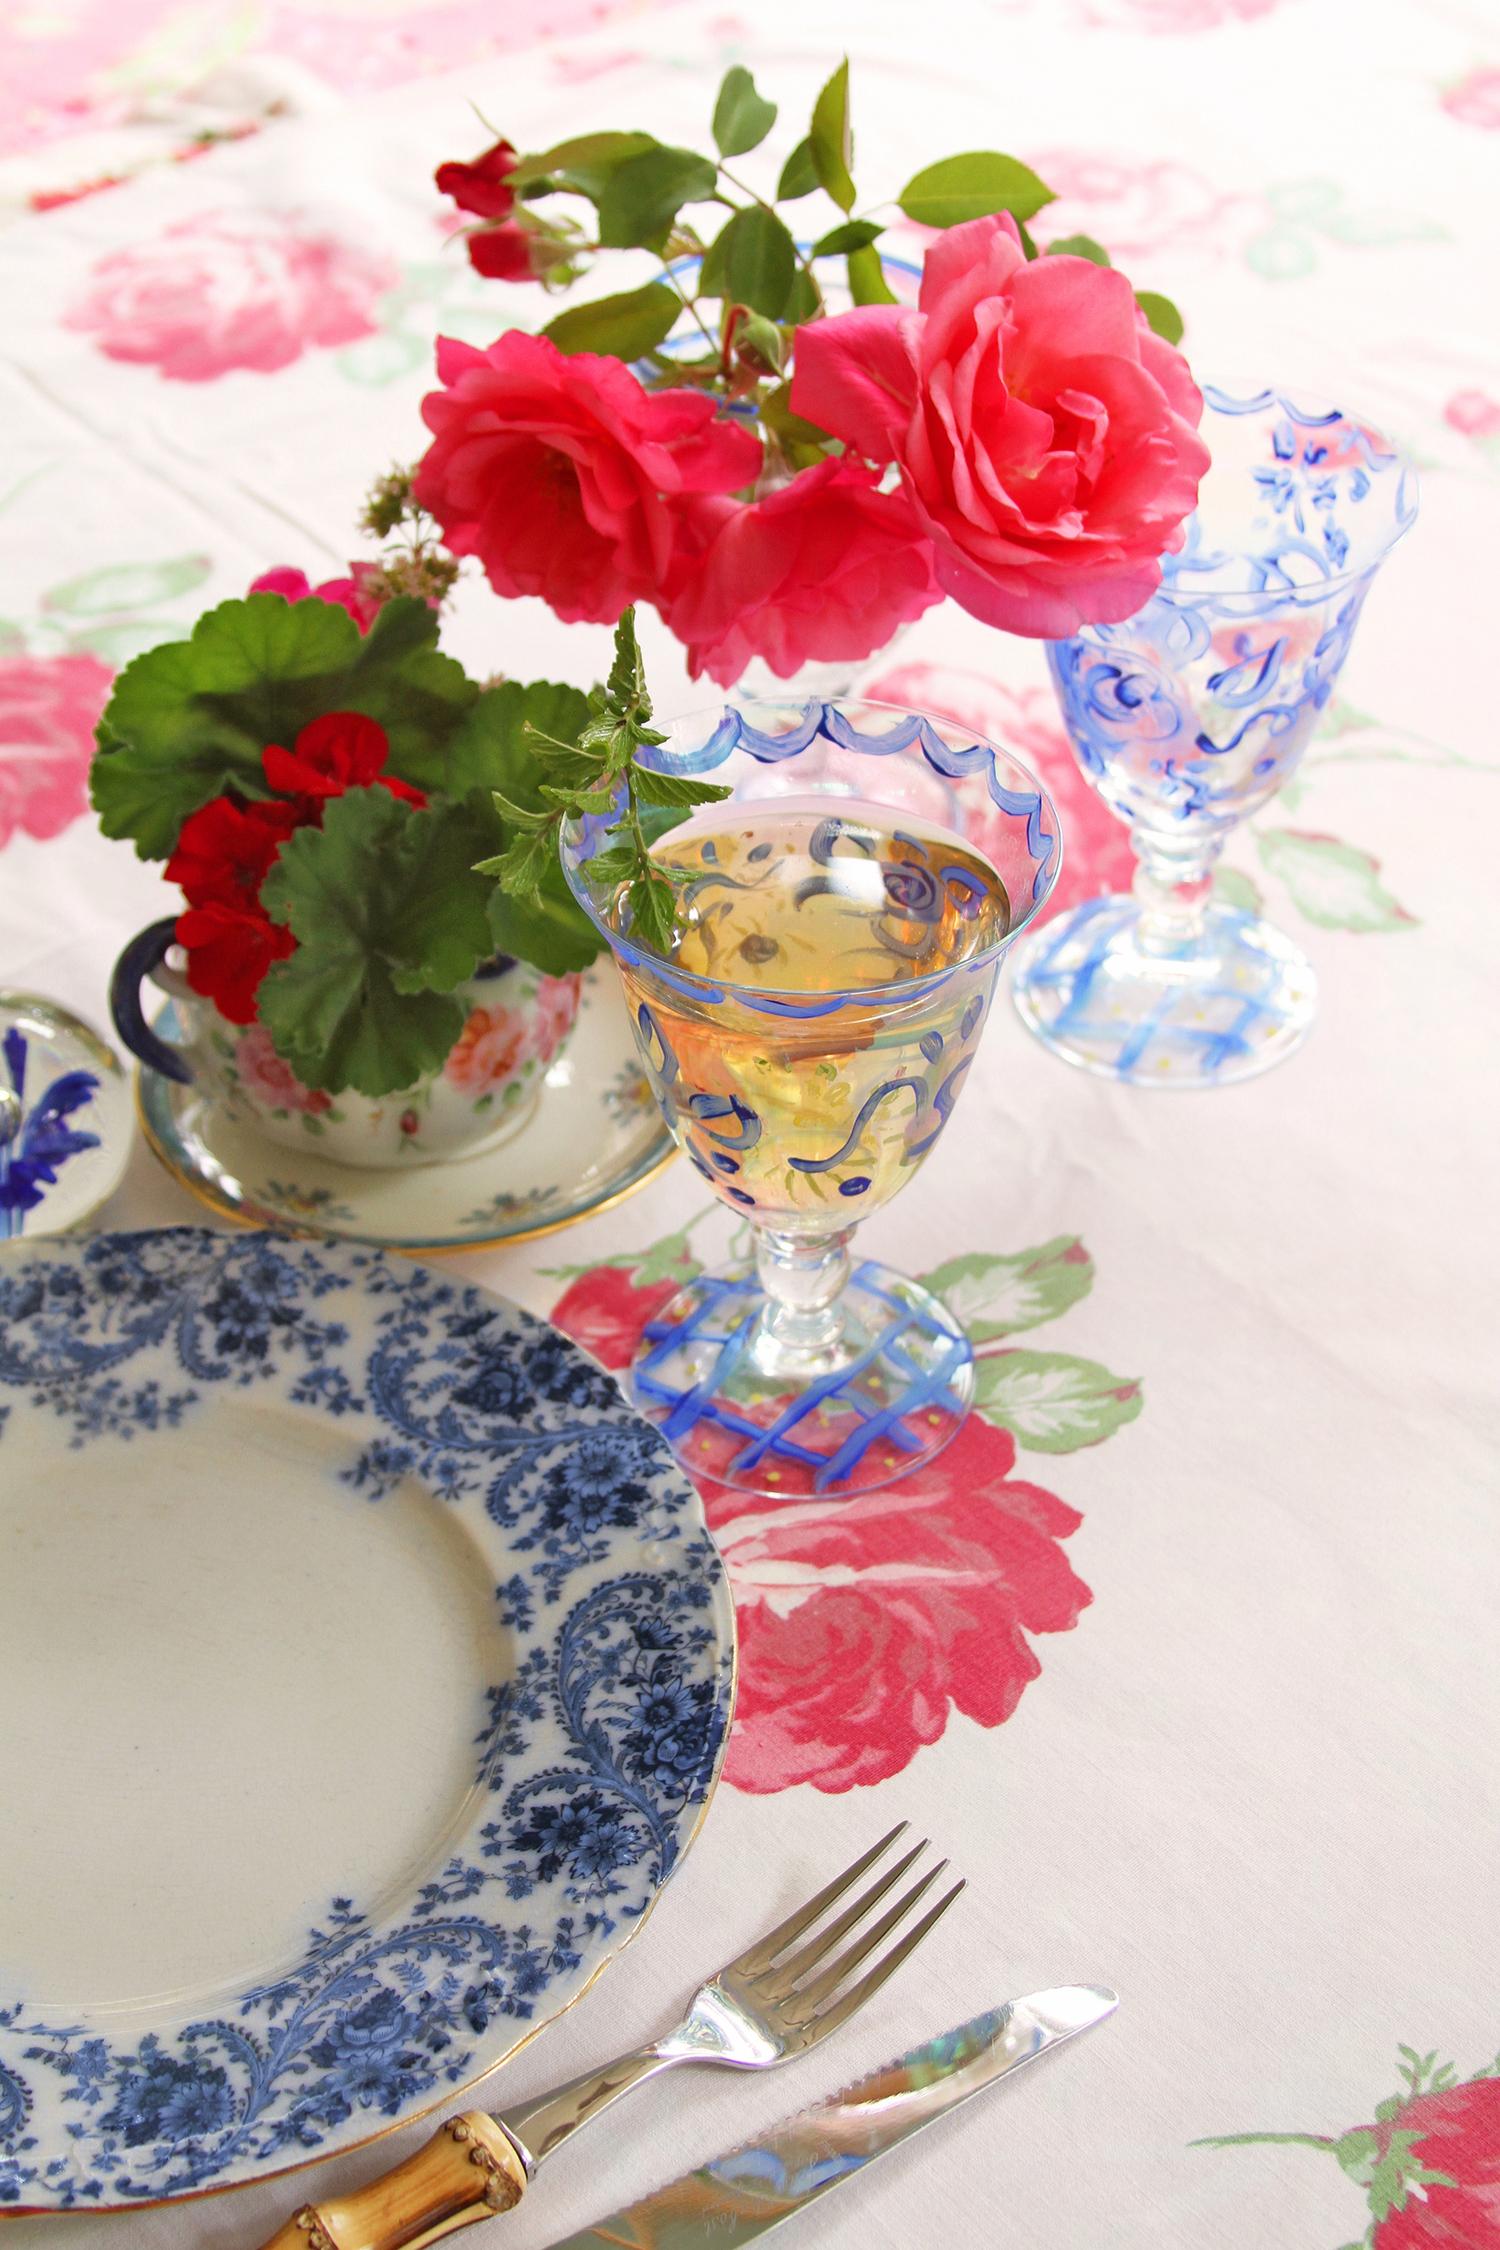 Hand-Painted Stemware Photo from Dena Designs